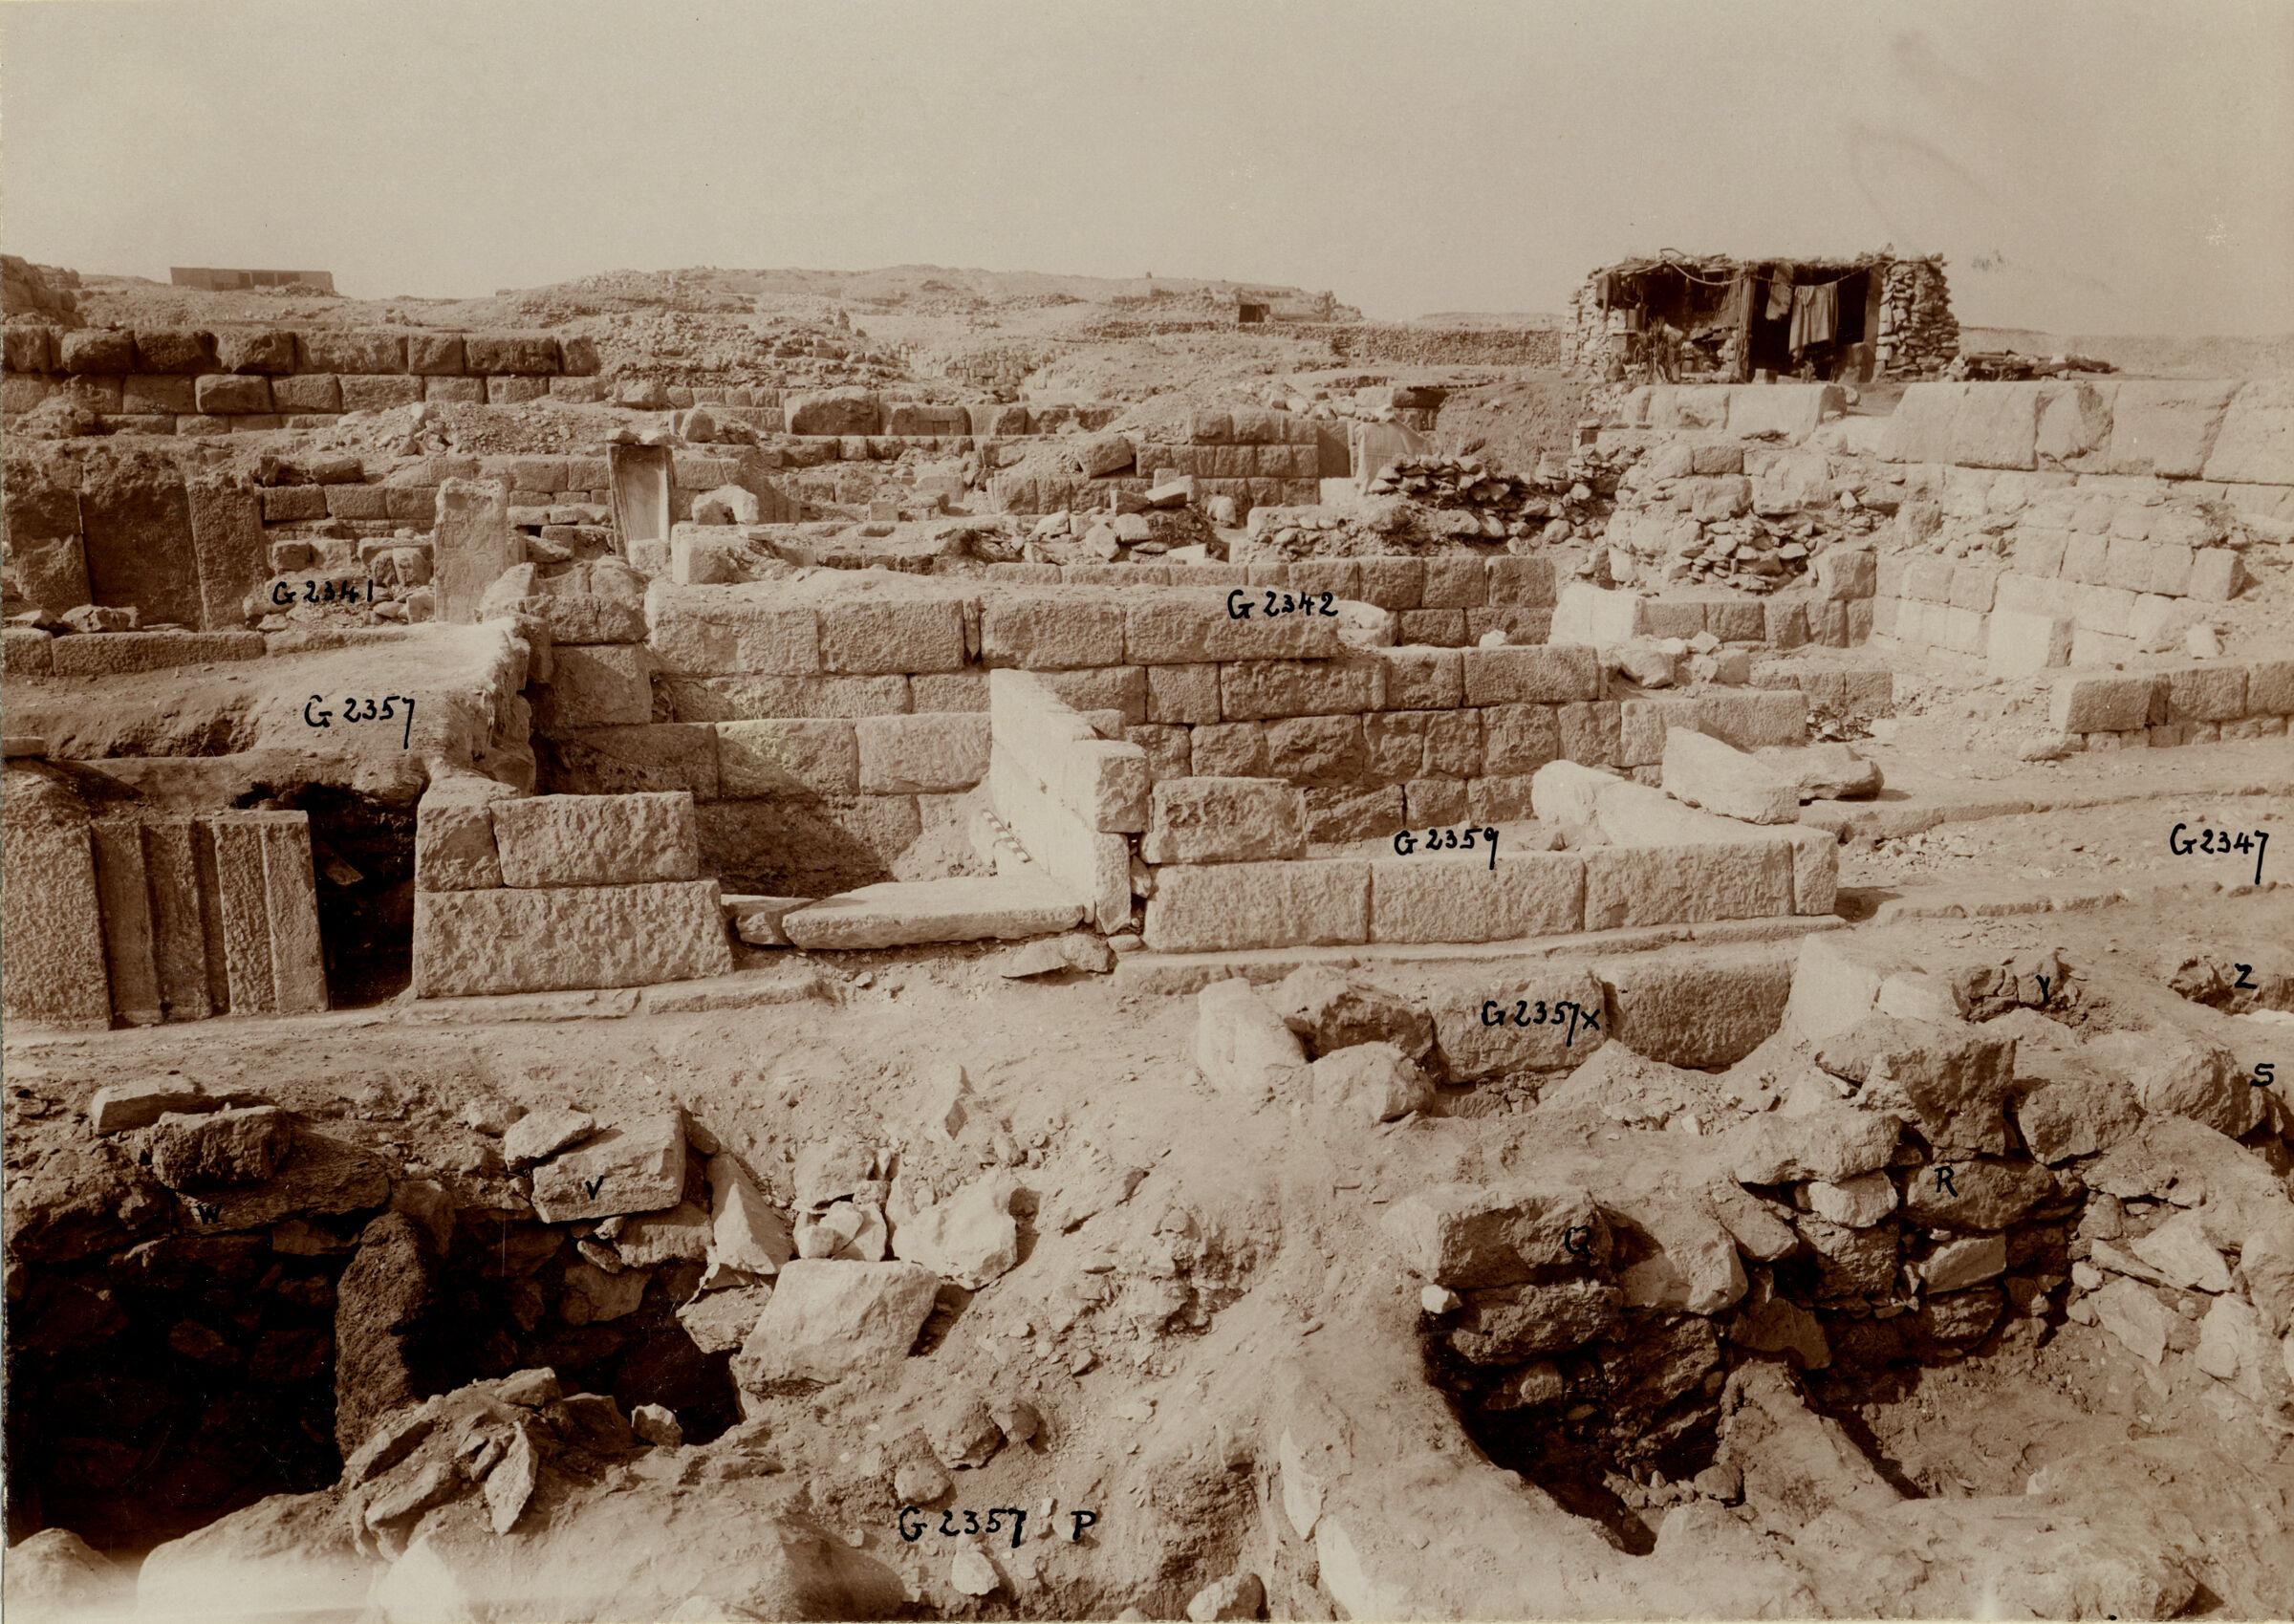 Western Cemetery: Site: Giza; View: G 5555, G 5554, G 5561, G 5552, G 5553, G 5551, G 5540, G 2342 = G 5520